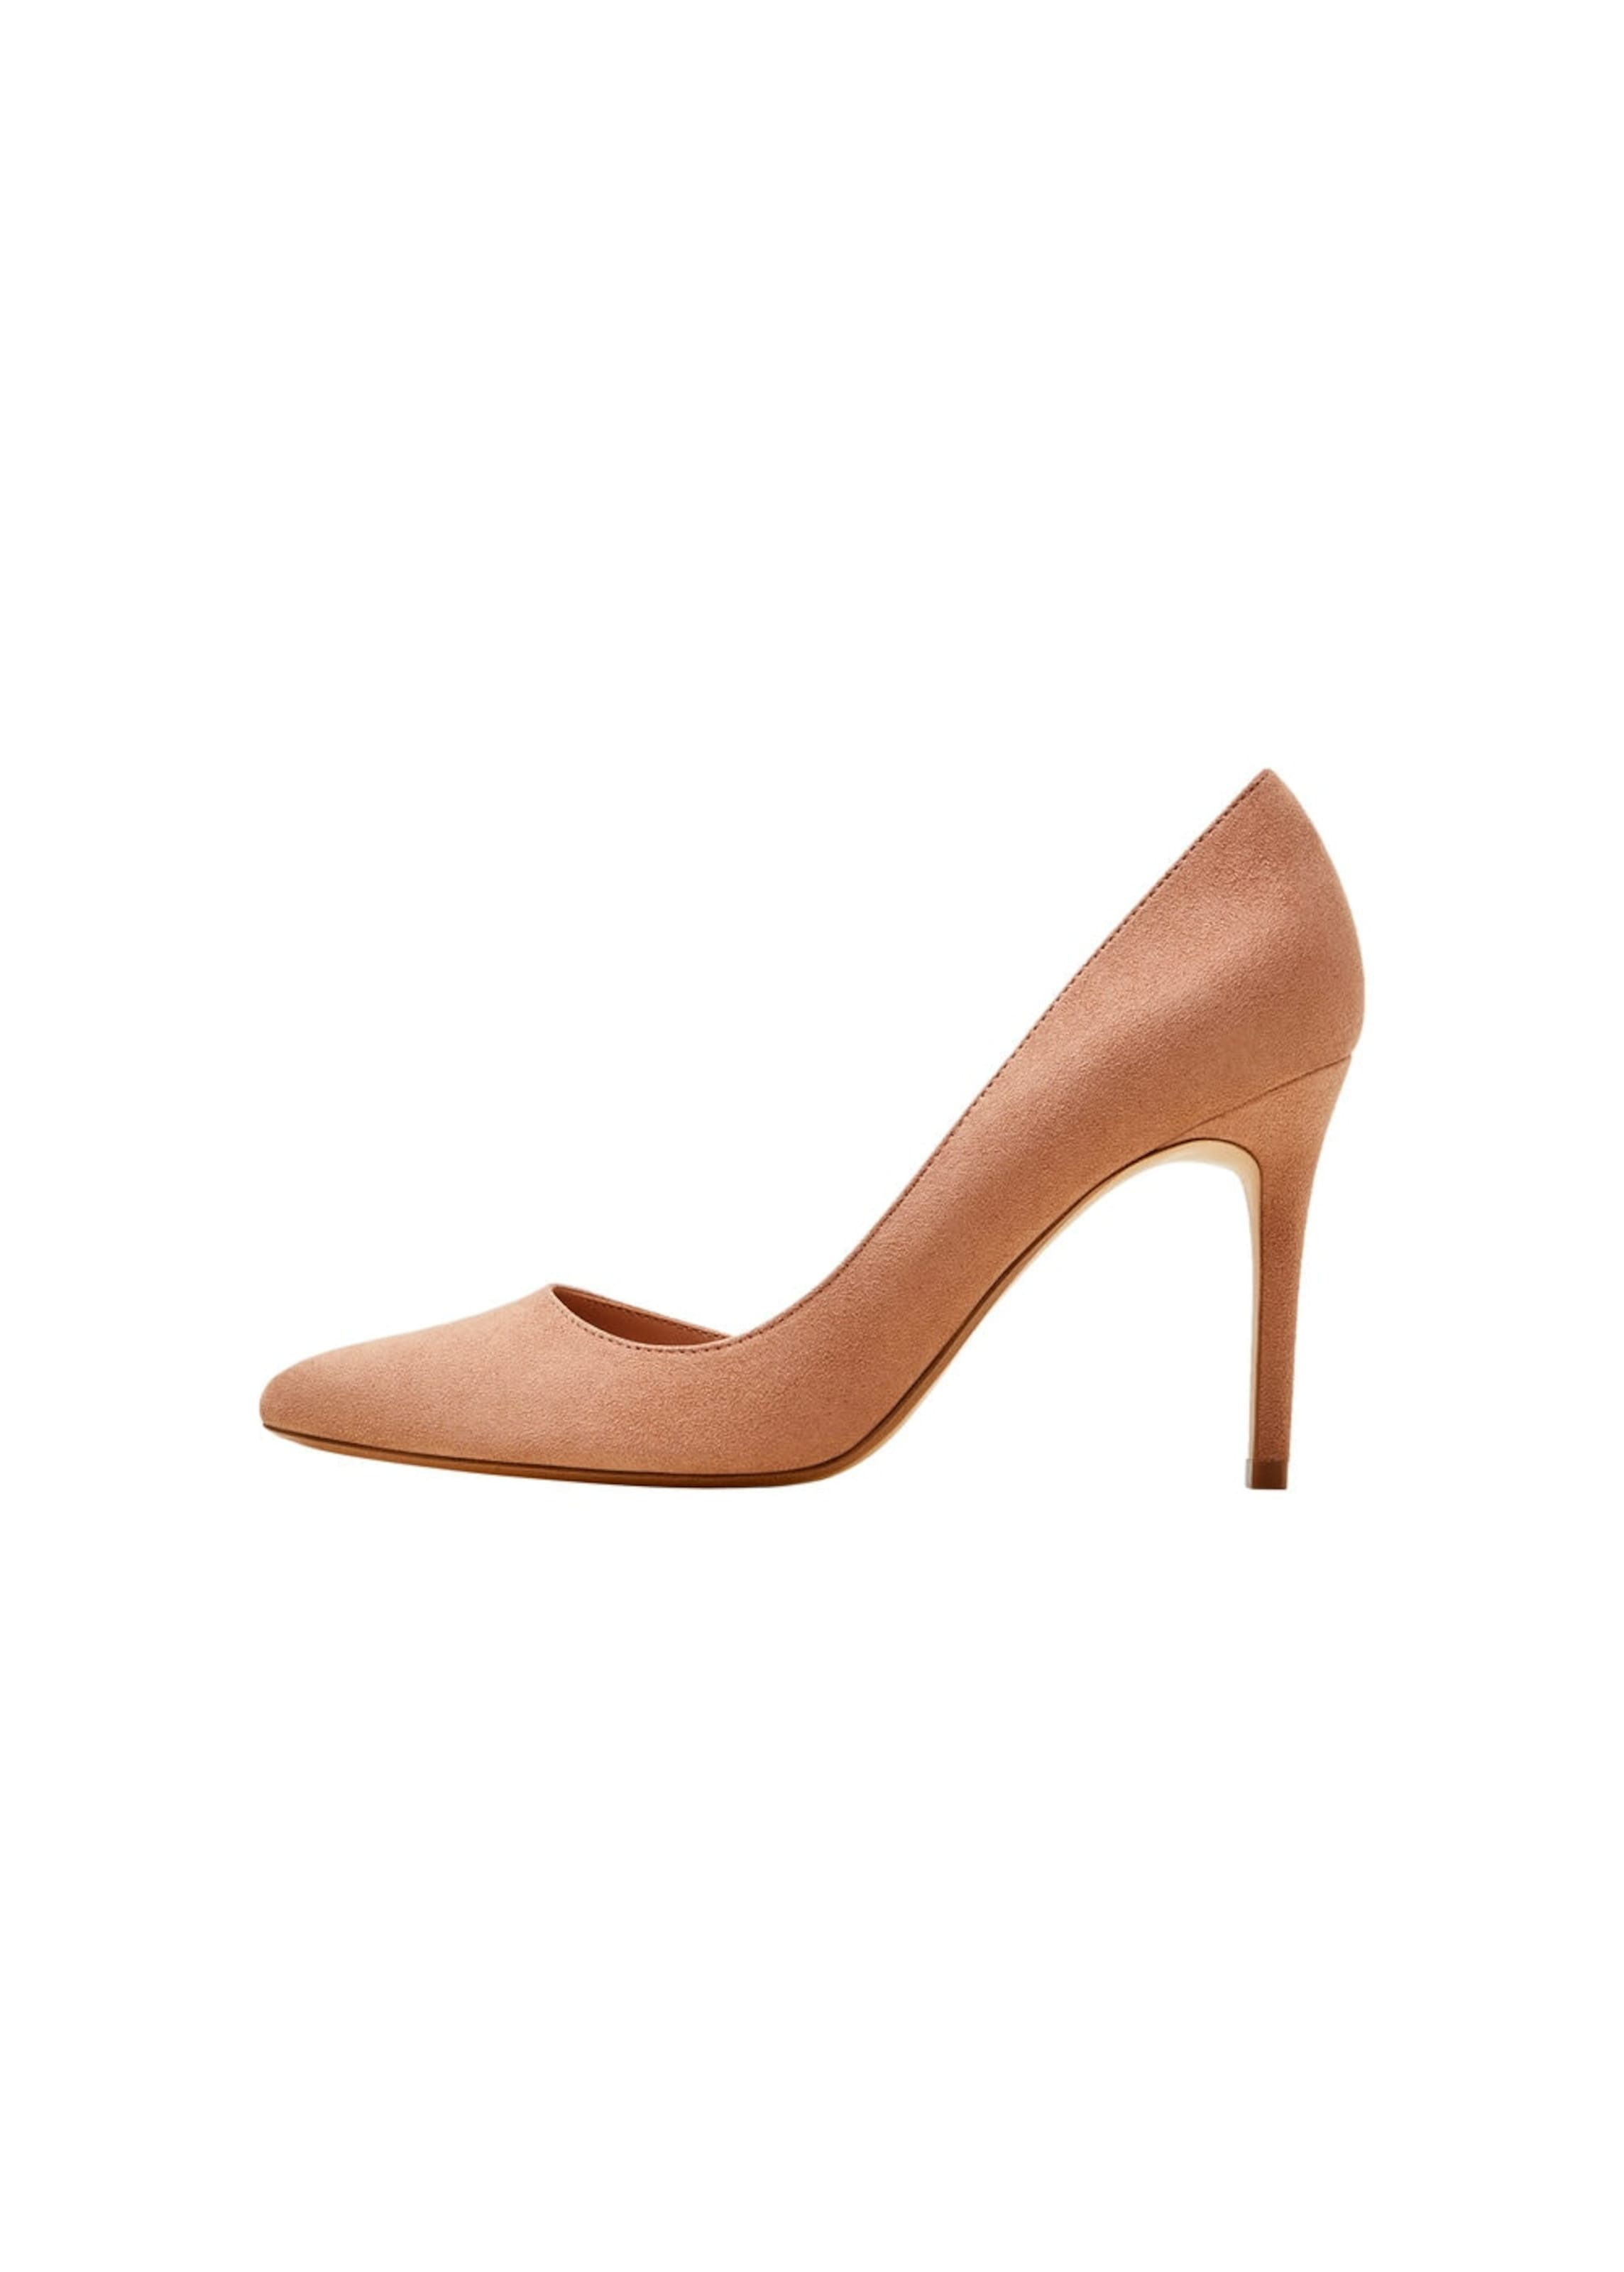 Schuh Schuh In 'audrey' In Rosé Rosé Mango Mango 'audrey' Mango CoeBdx